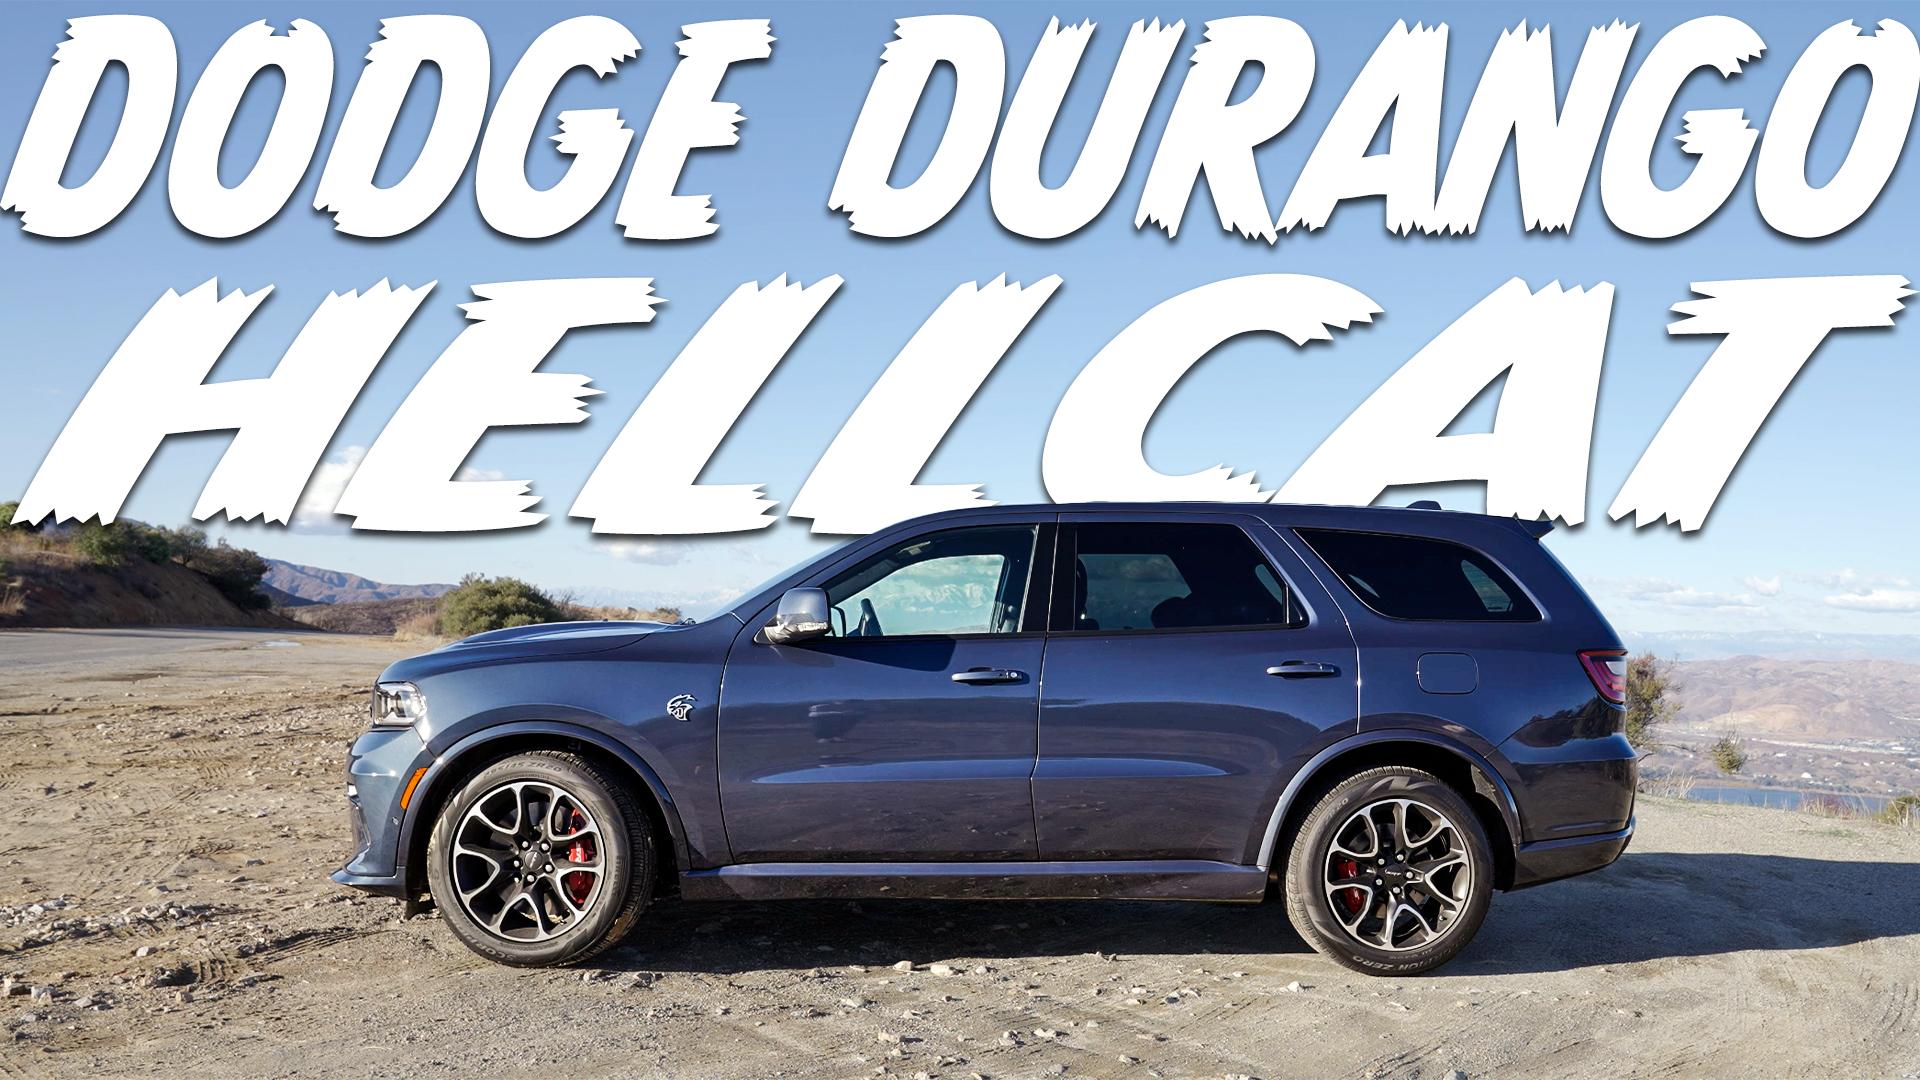 Dodge Durango Hellcat parked